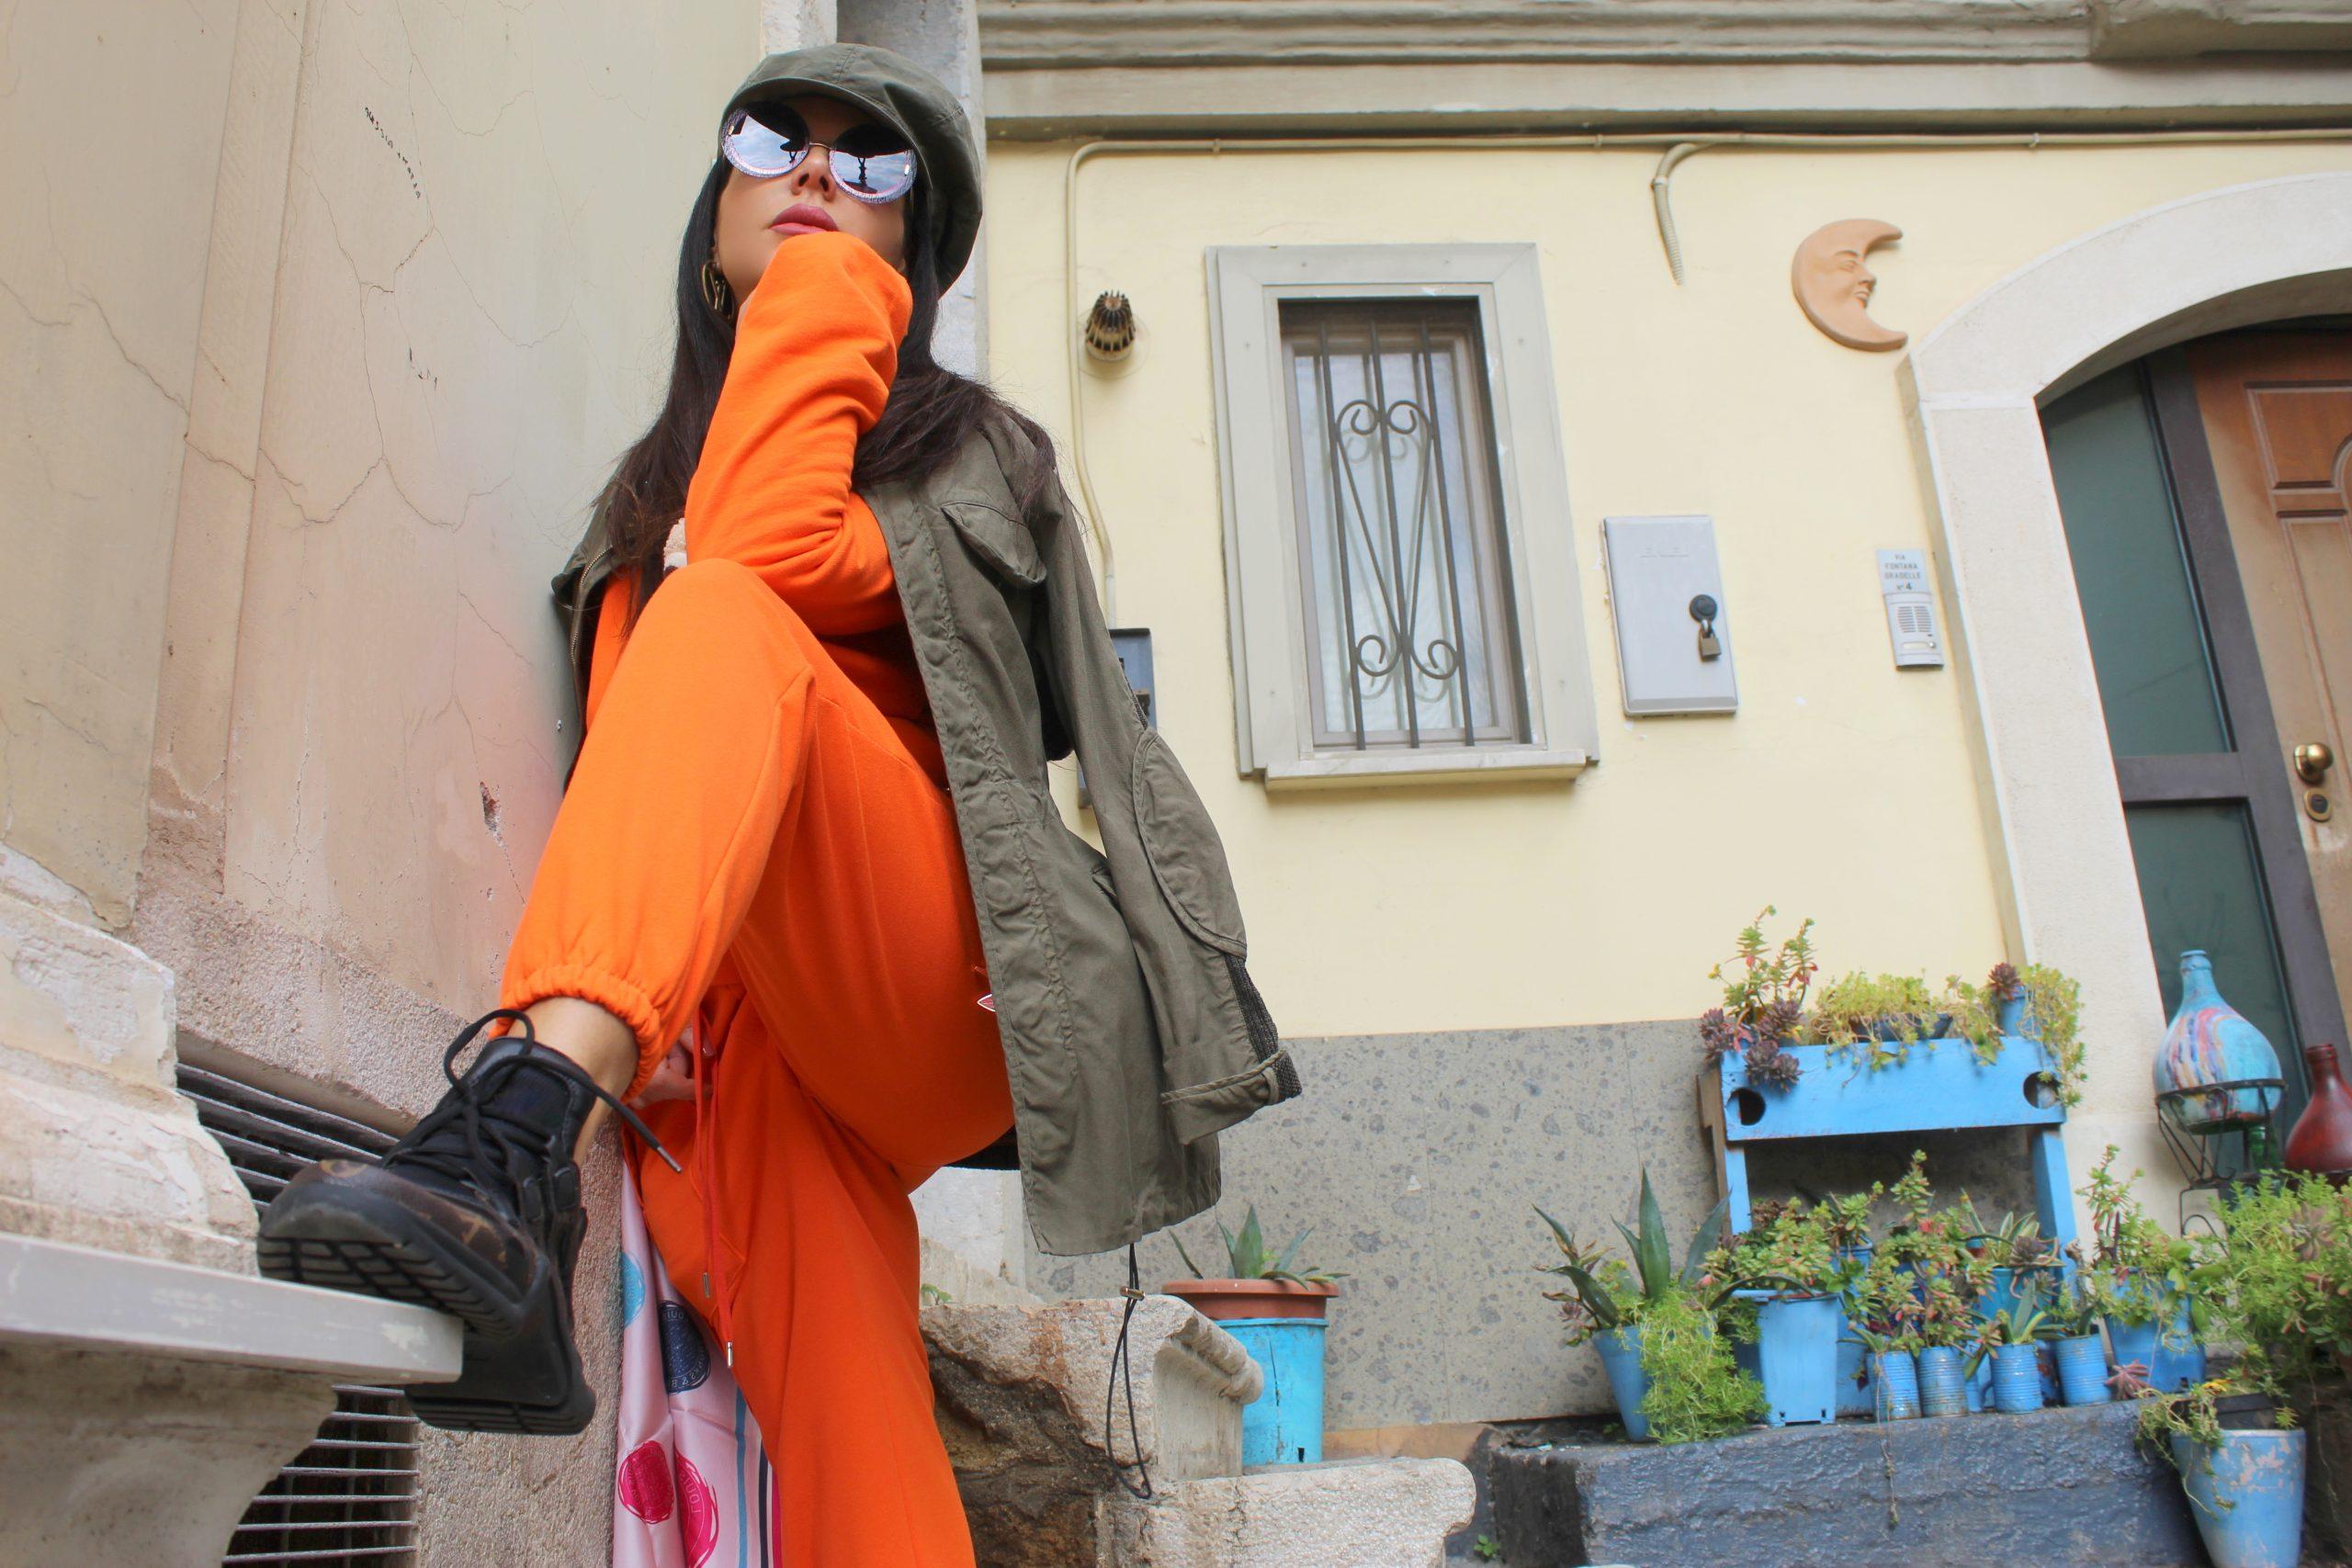 Louis Vuitton Bag Orange Outfit Inspo Style Paola Lauretano Lifestyle Blogger